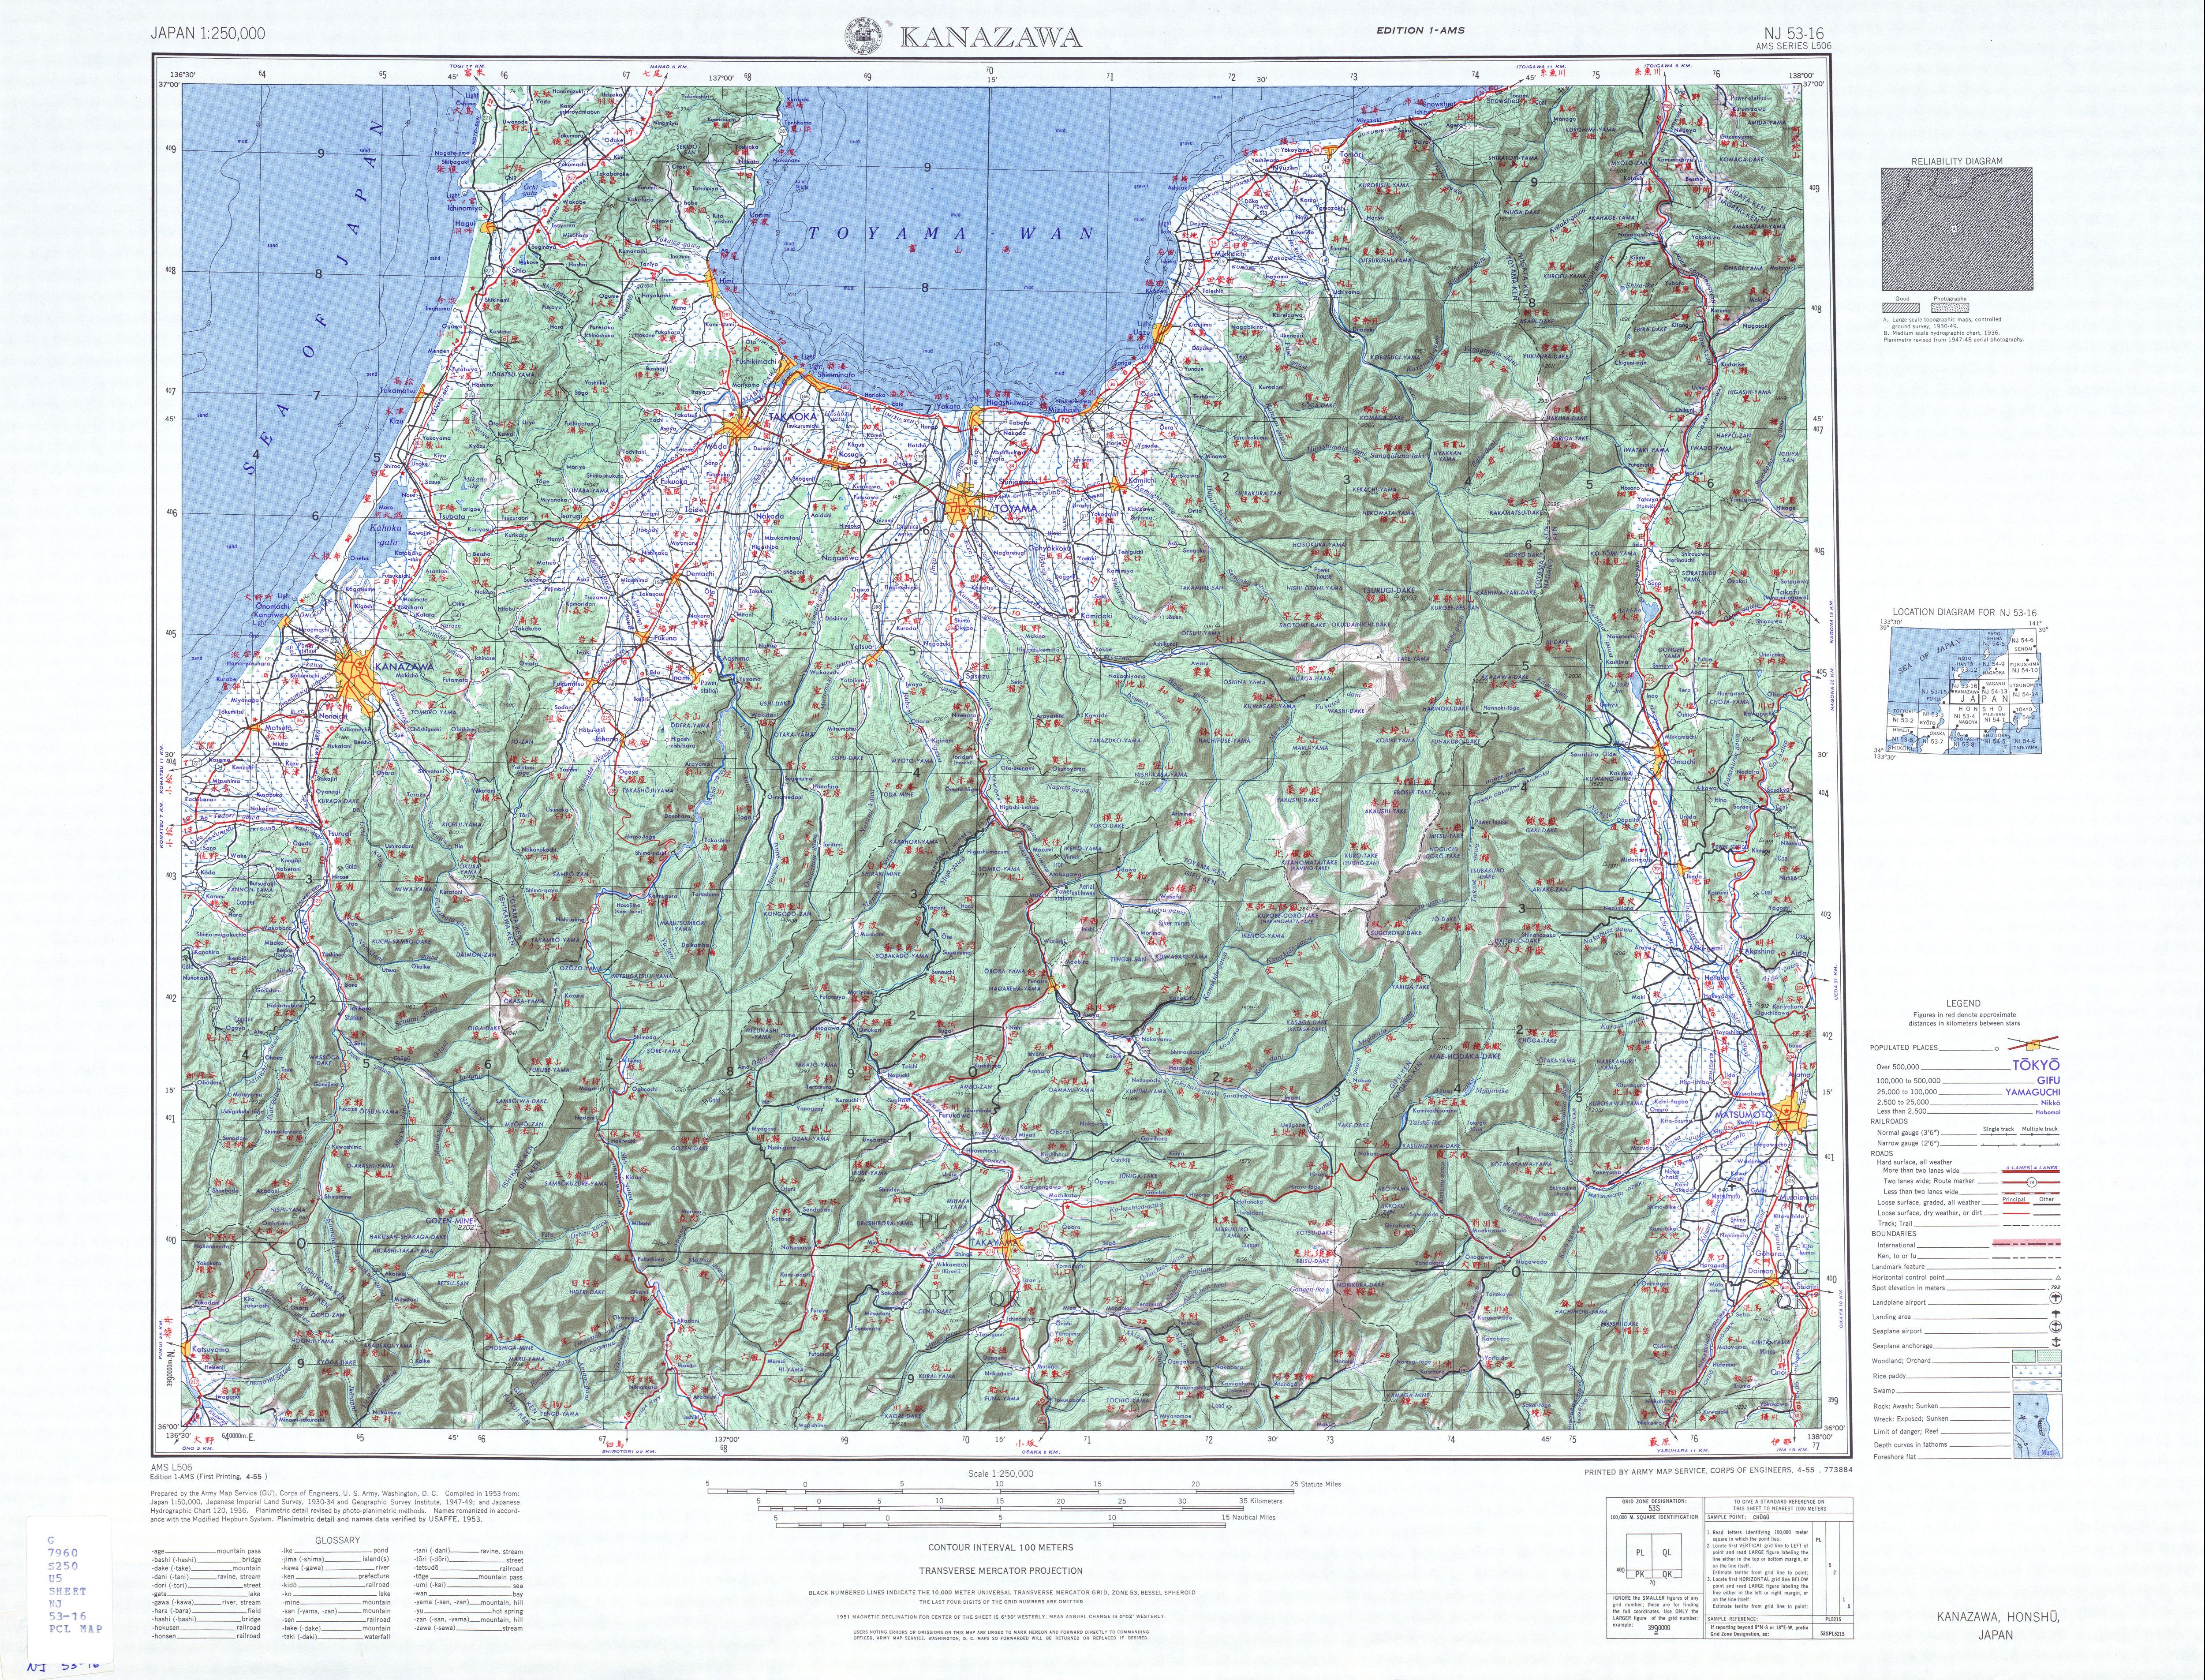 Kanazawa Topographic Map Sheet, Japan 1954